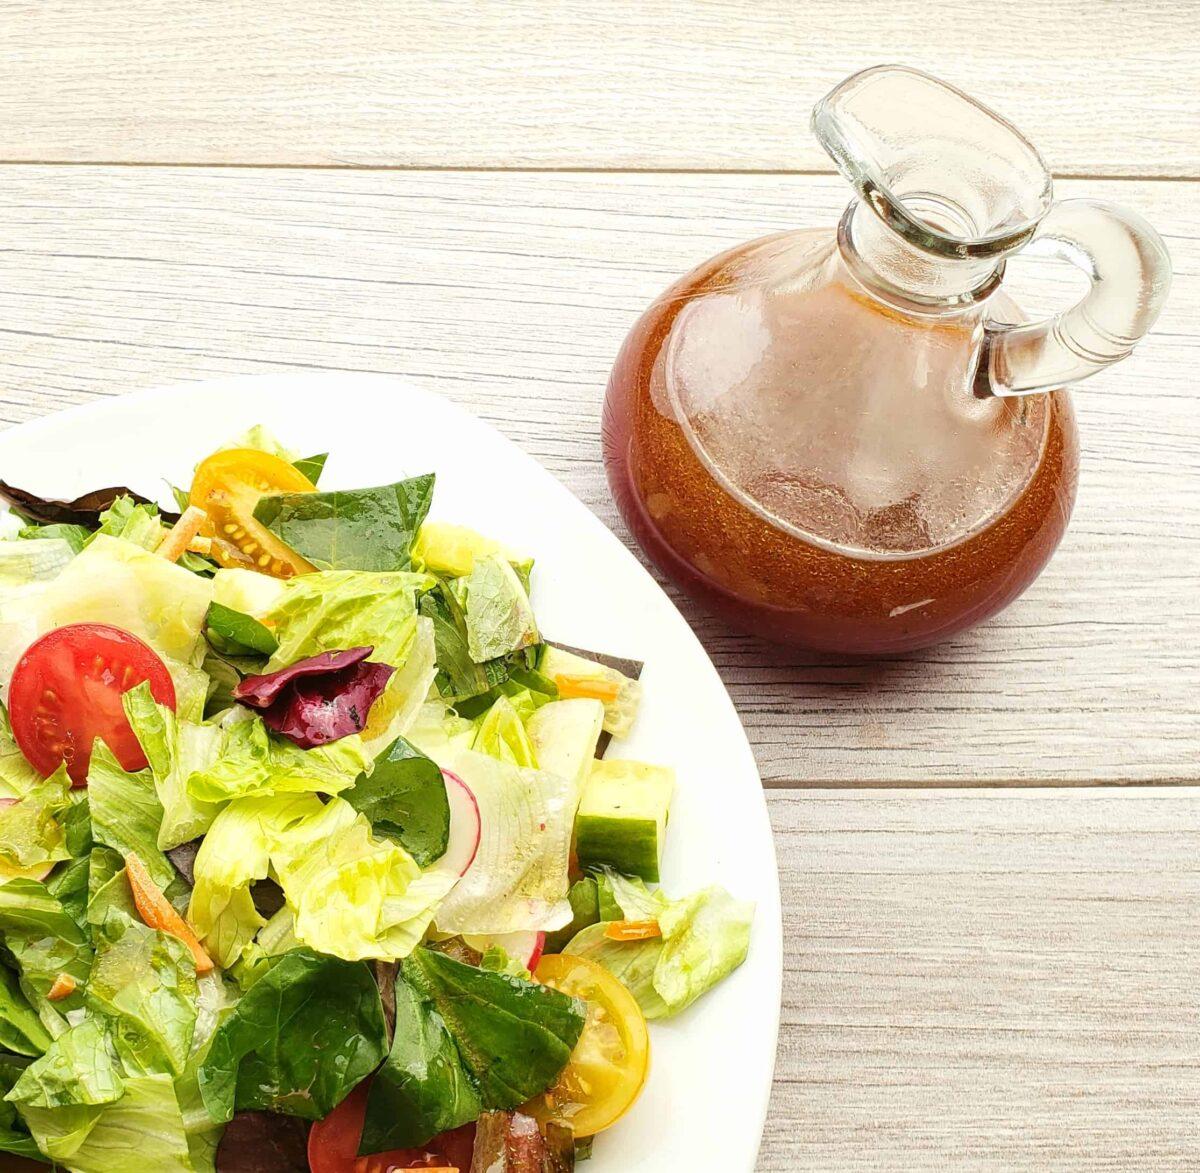 Black Raspberry Vinaigrette in a glass cruet, a tossed salad from overhead view